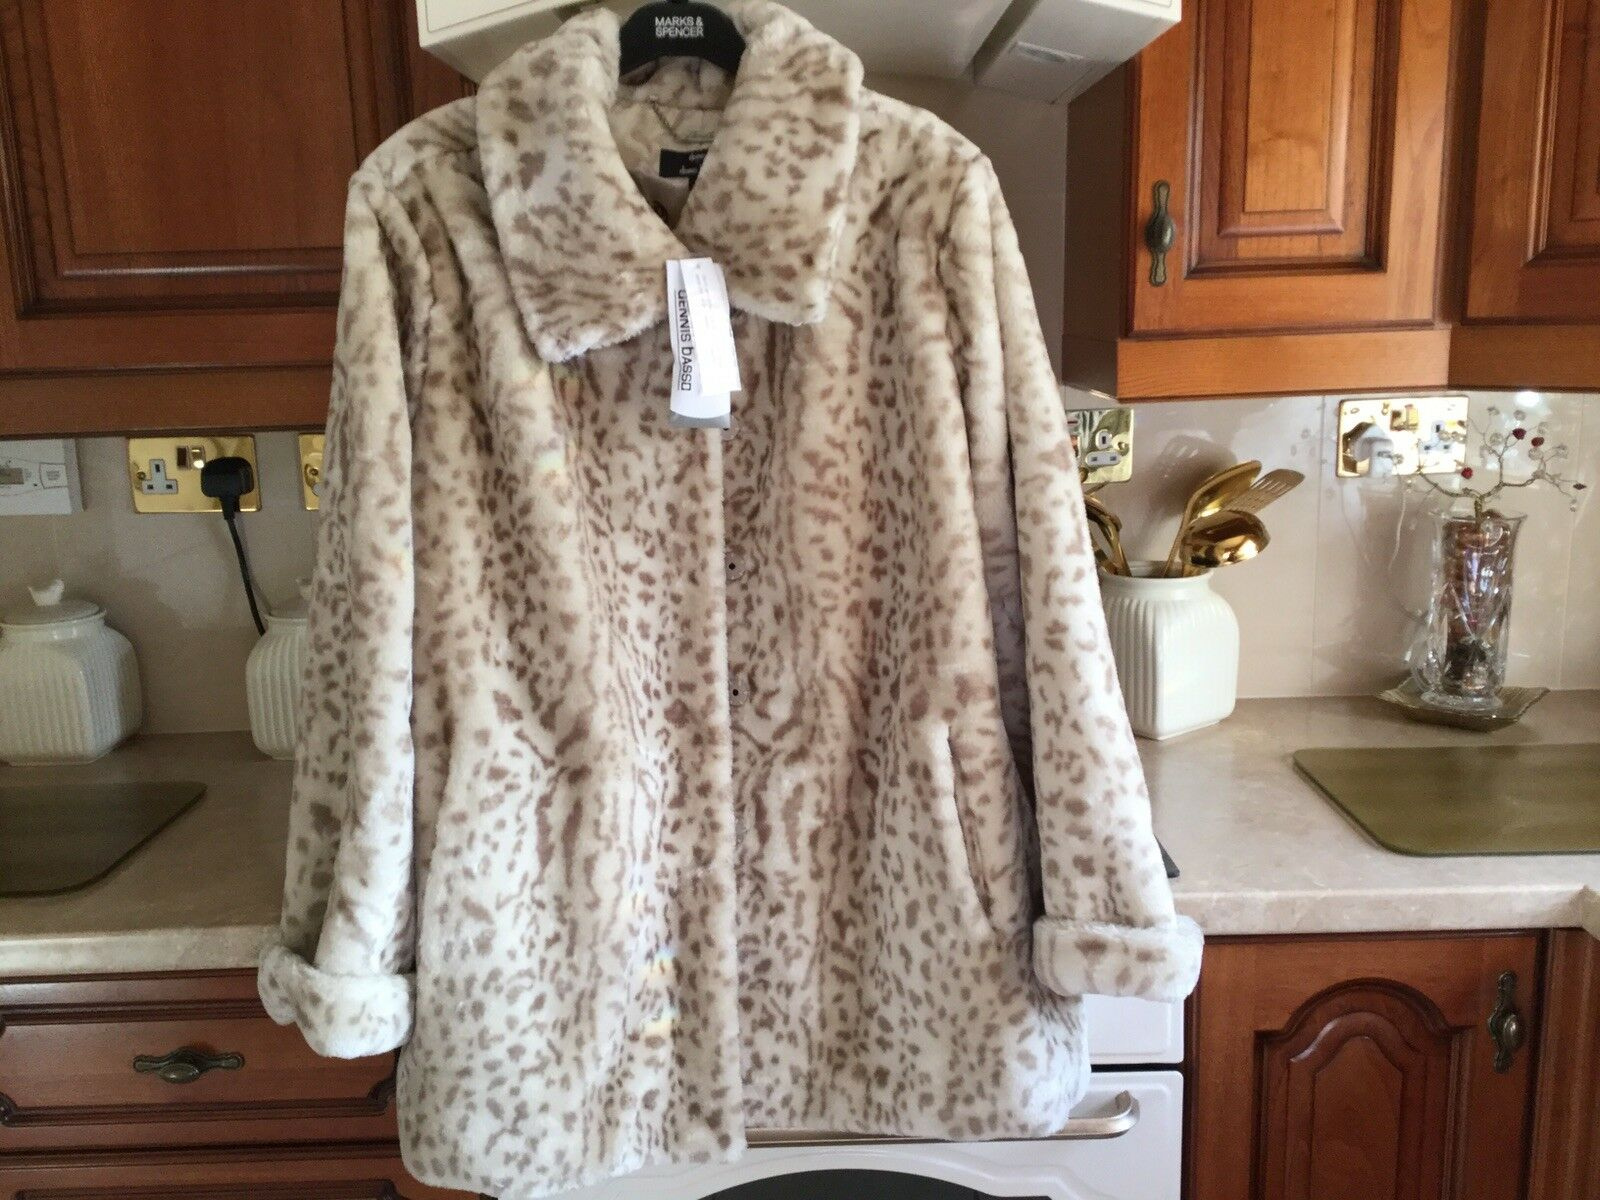 Dennis Basso Ivory Animal Print Faux Fur Coat (BNWT)